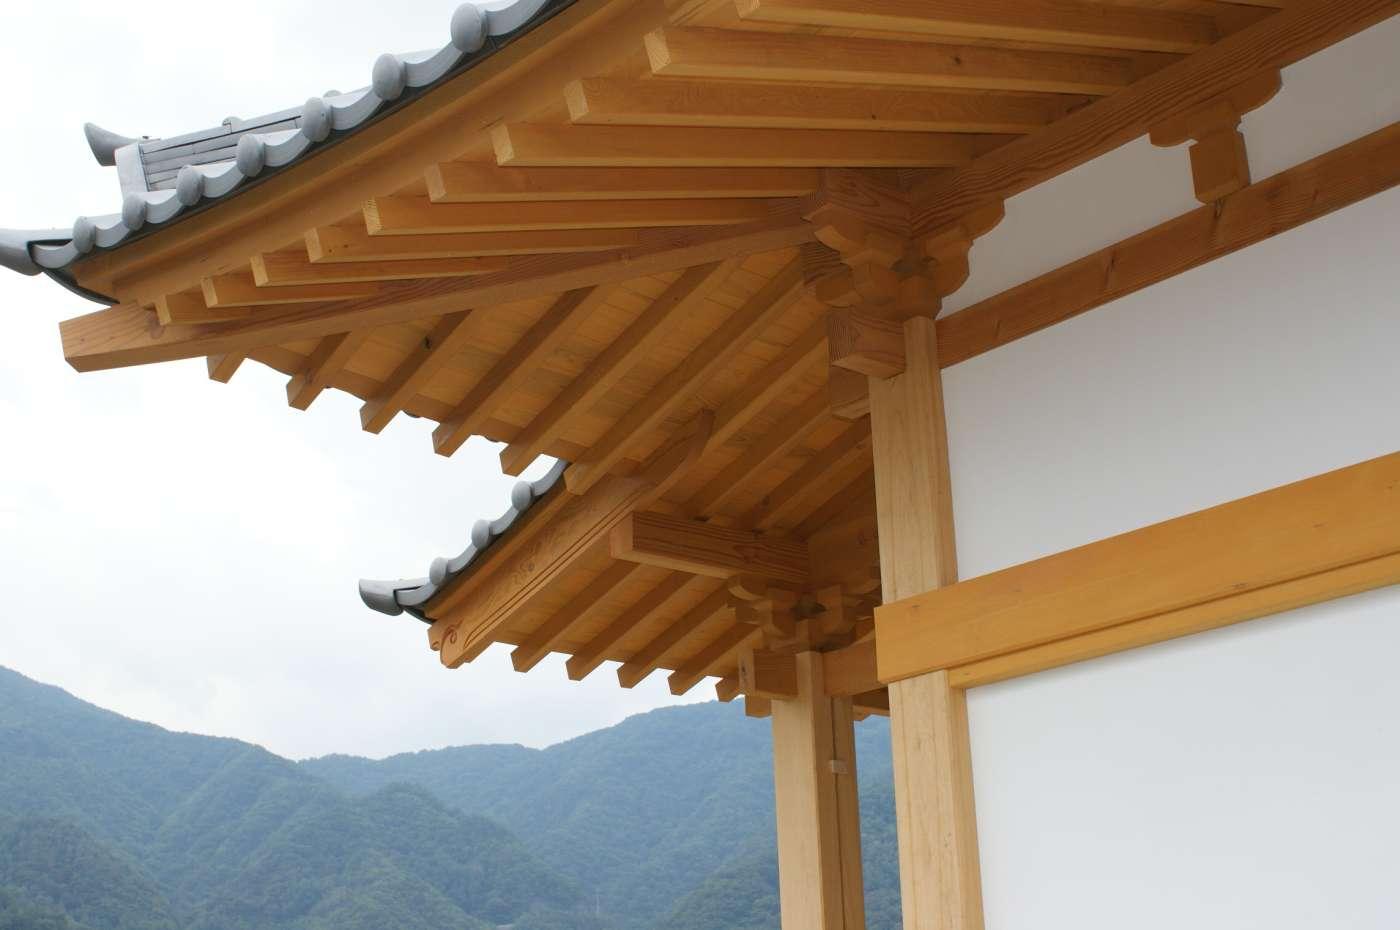 http://sumainomatsuki.com/folder1/DSC05031.JPG